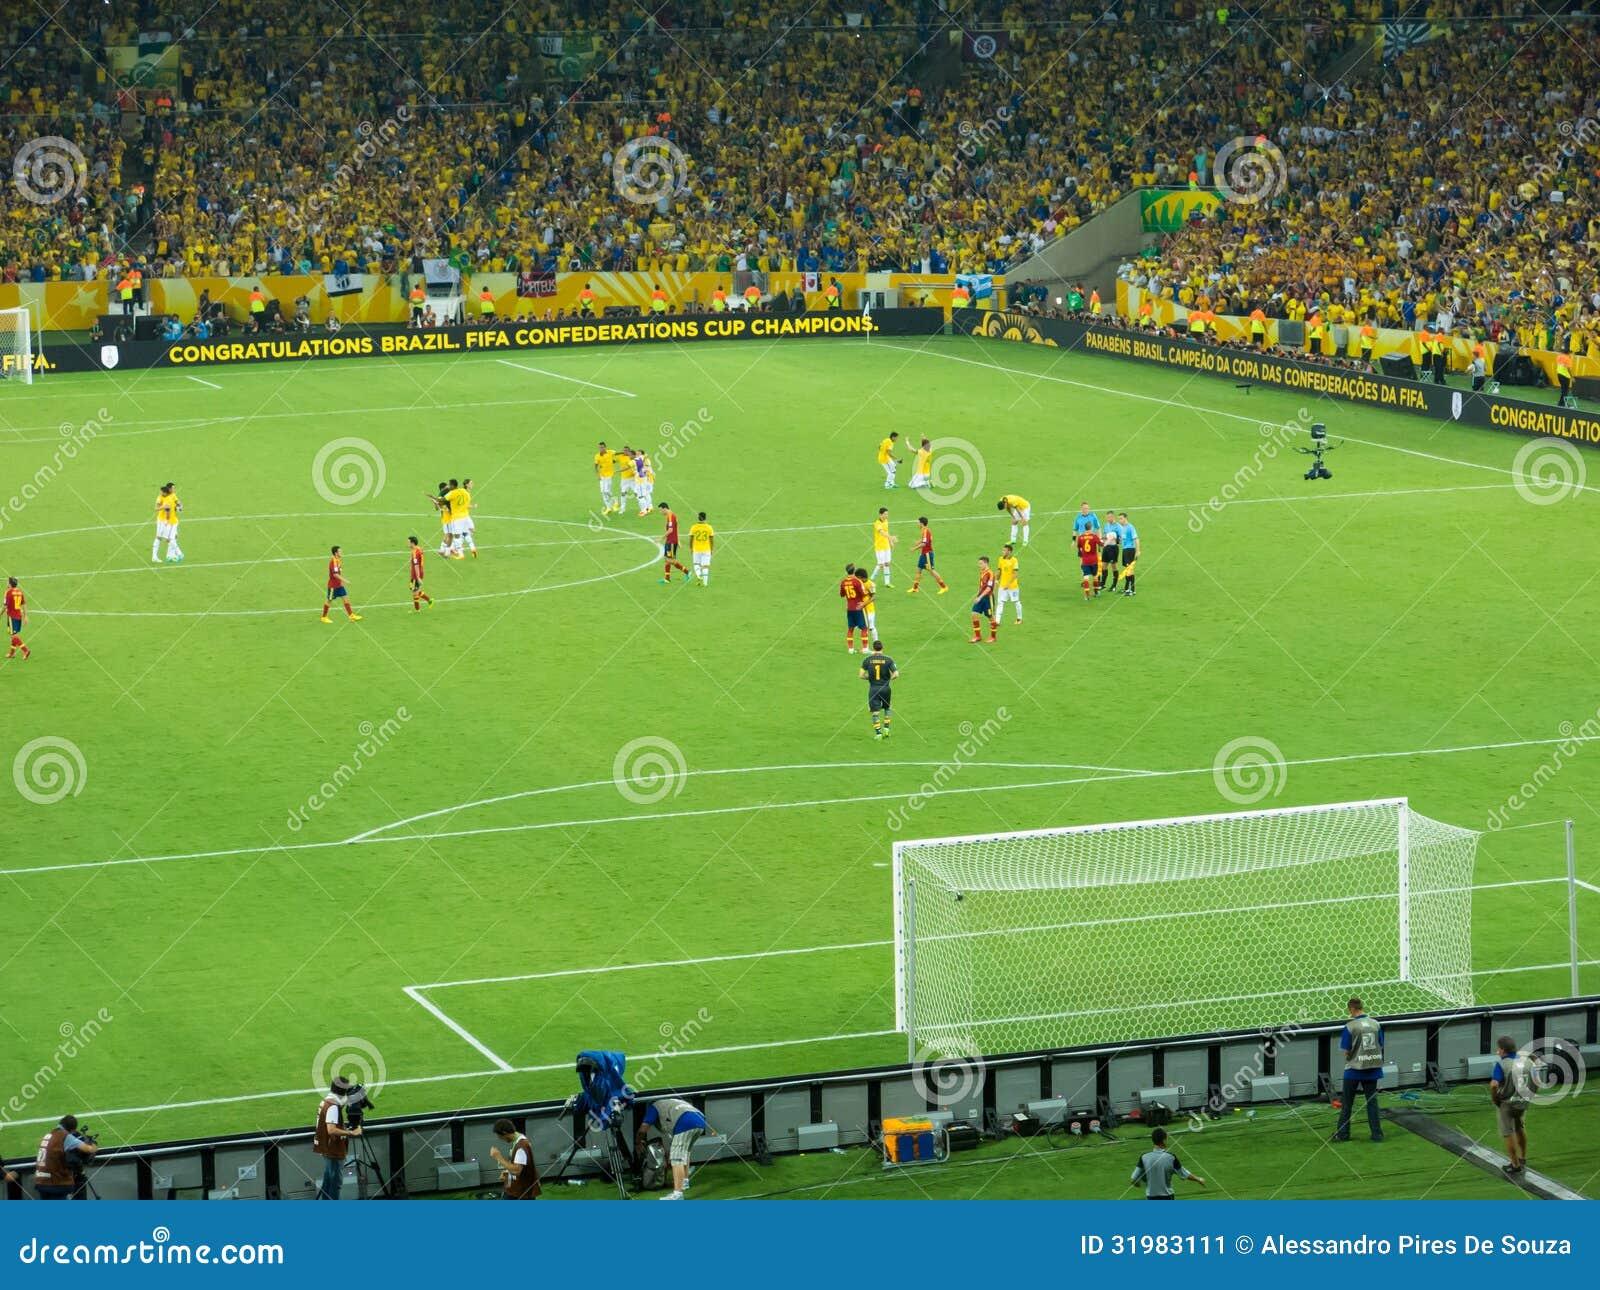 Final match brazil 3 0 spain fifa confederations cup final maracana